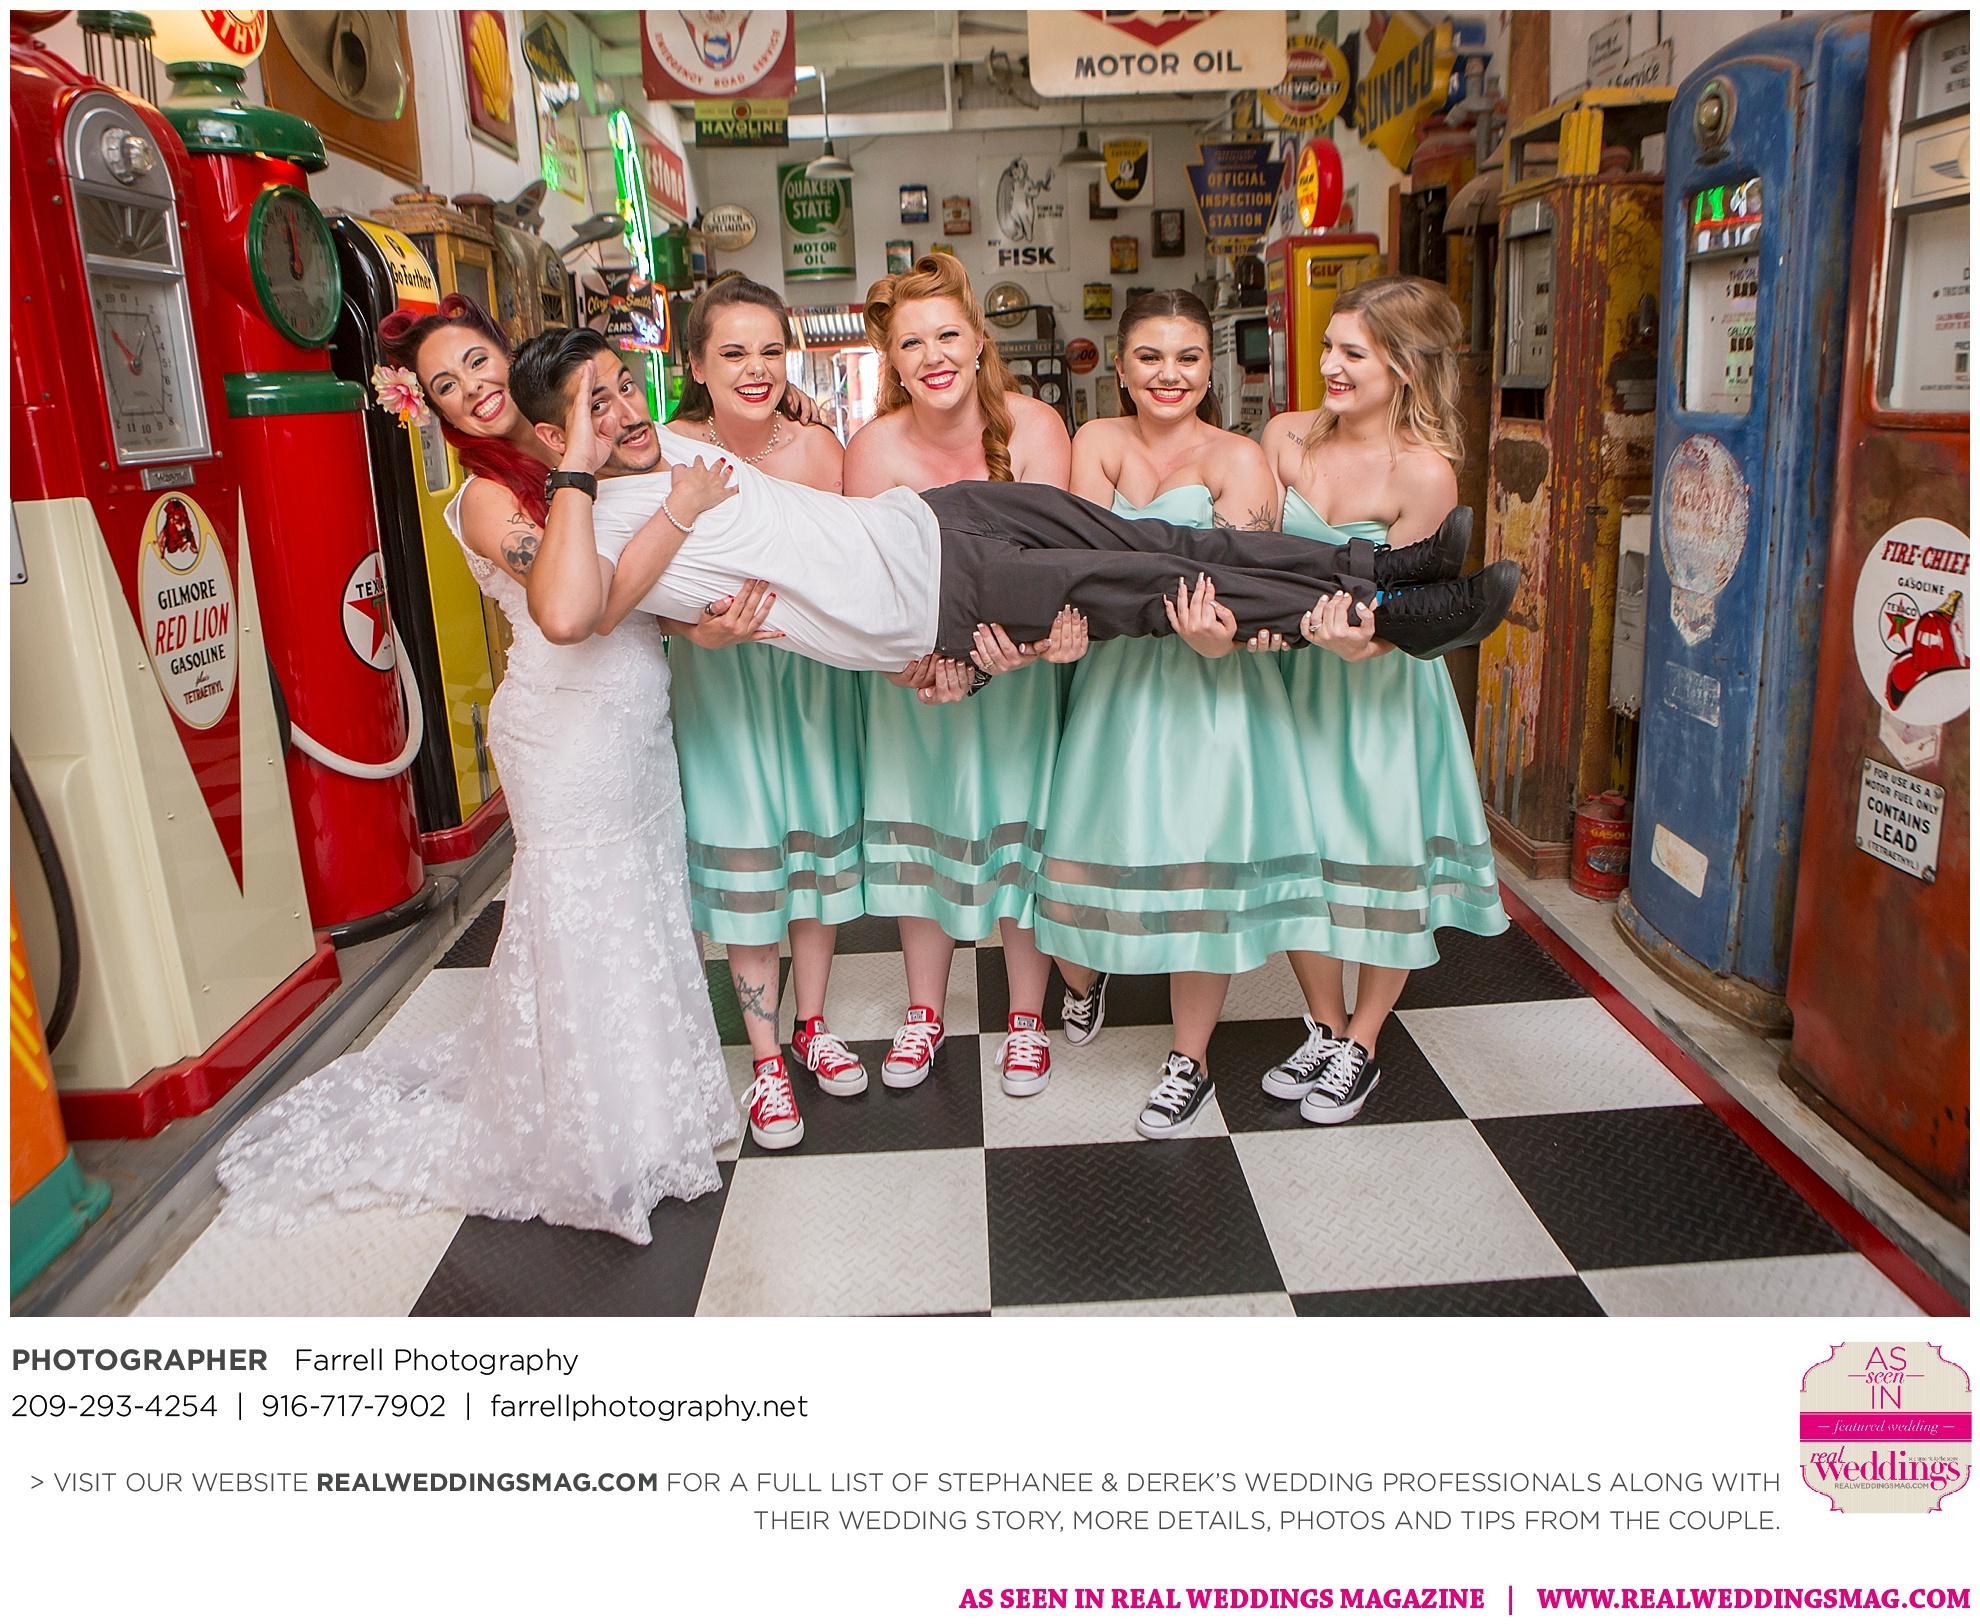 farrell-photography-stephanee-derek-real-weddings-sacramento-wedding-photographer-_0045